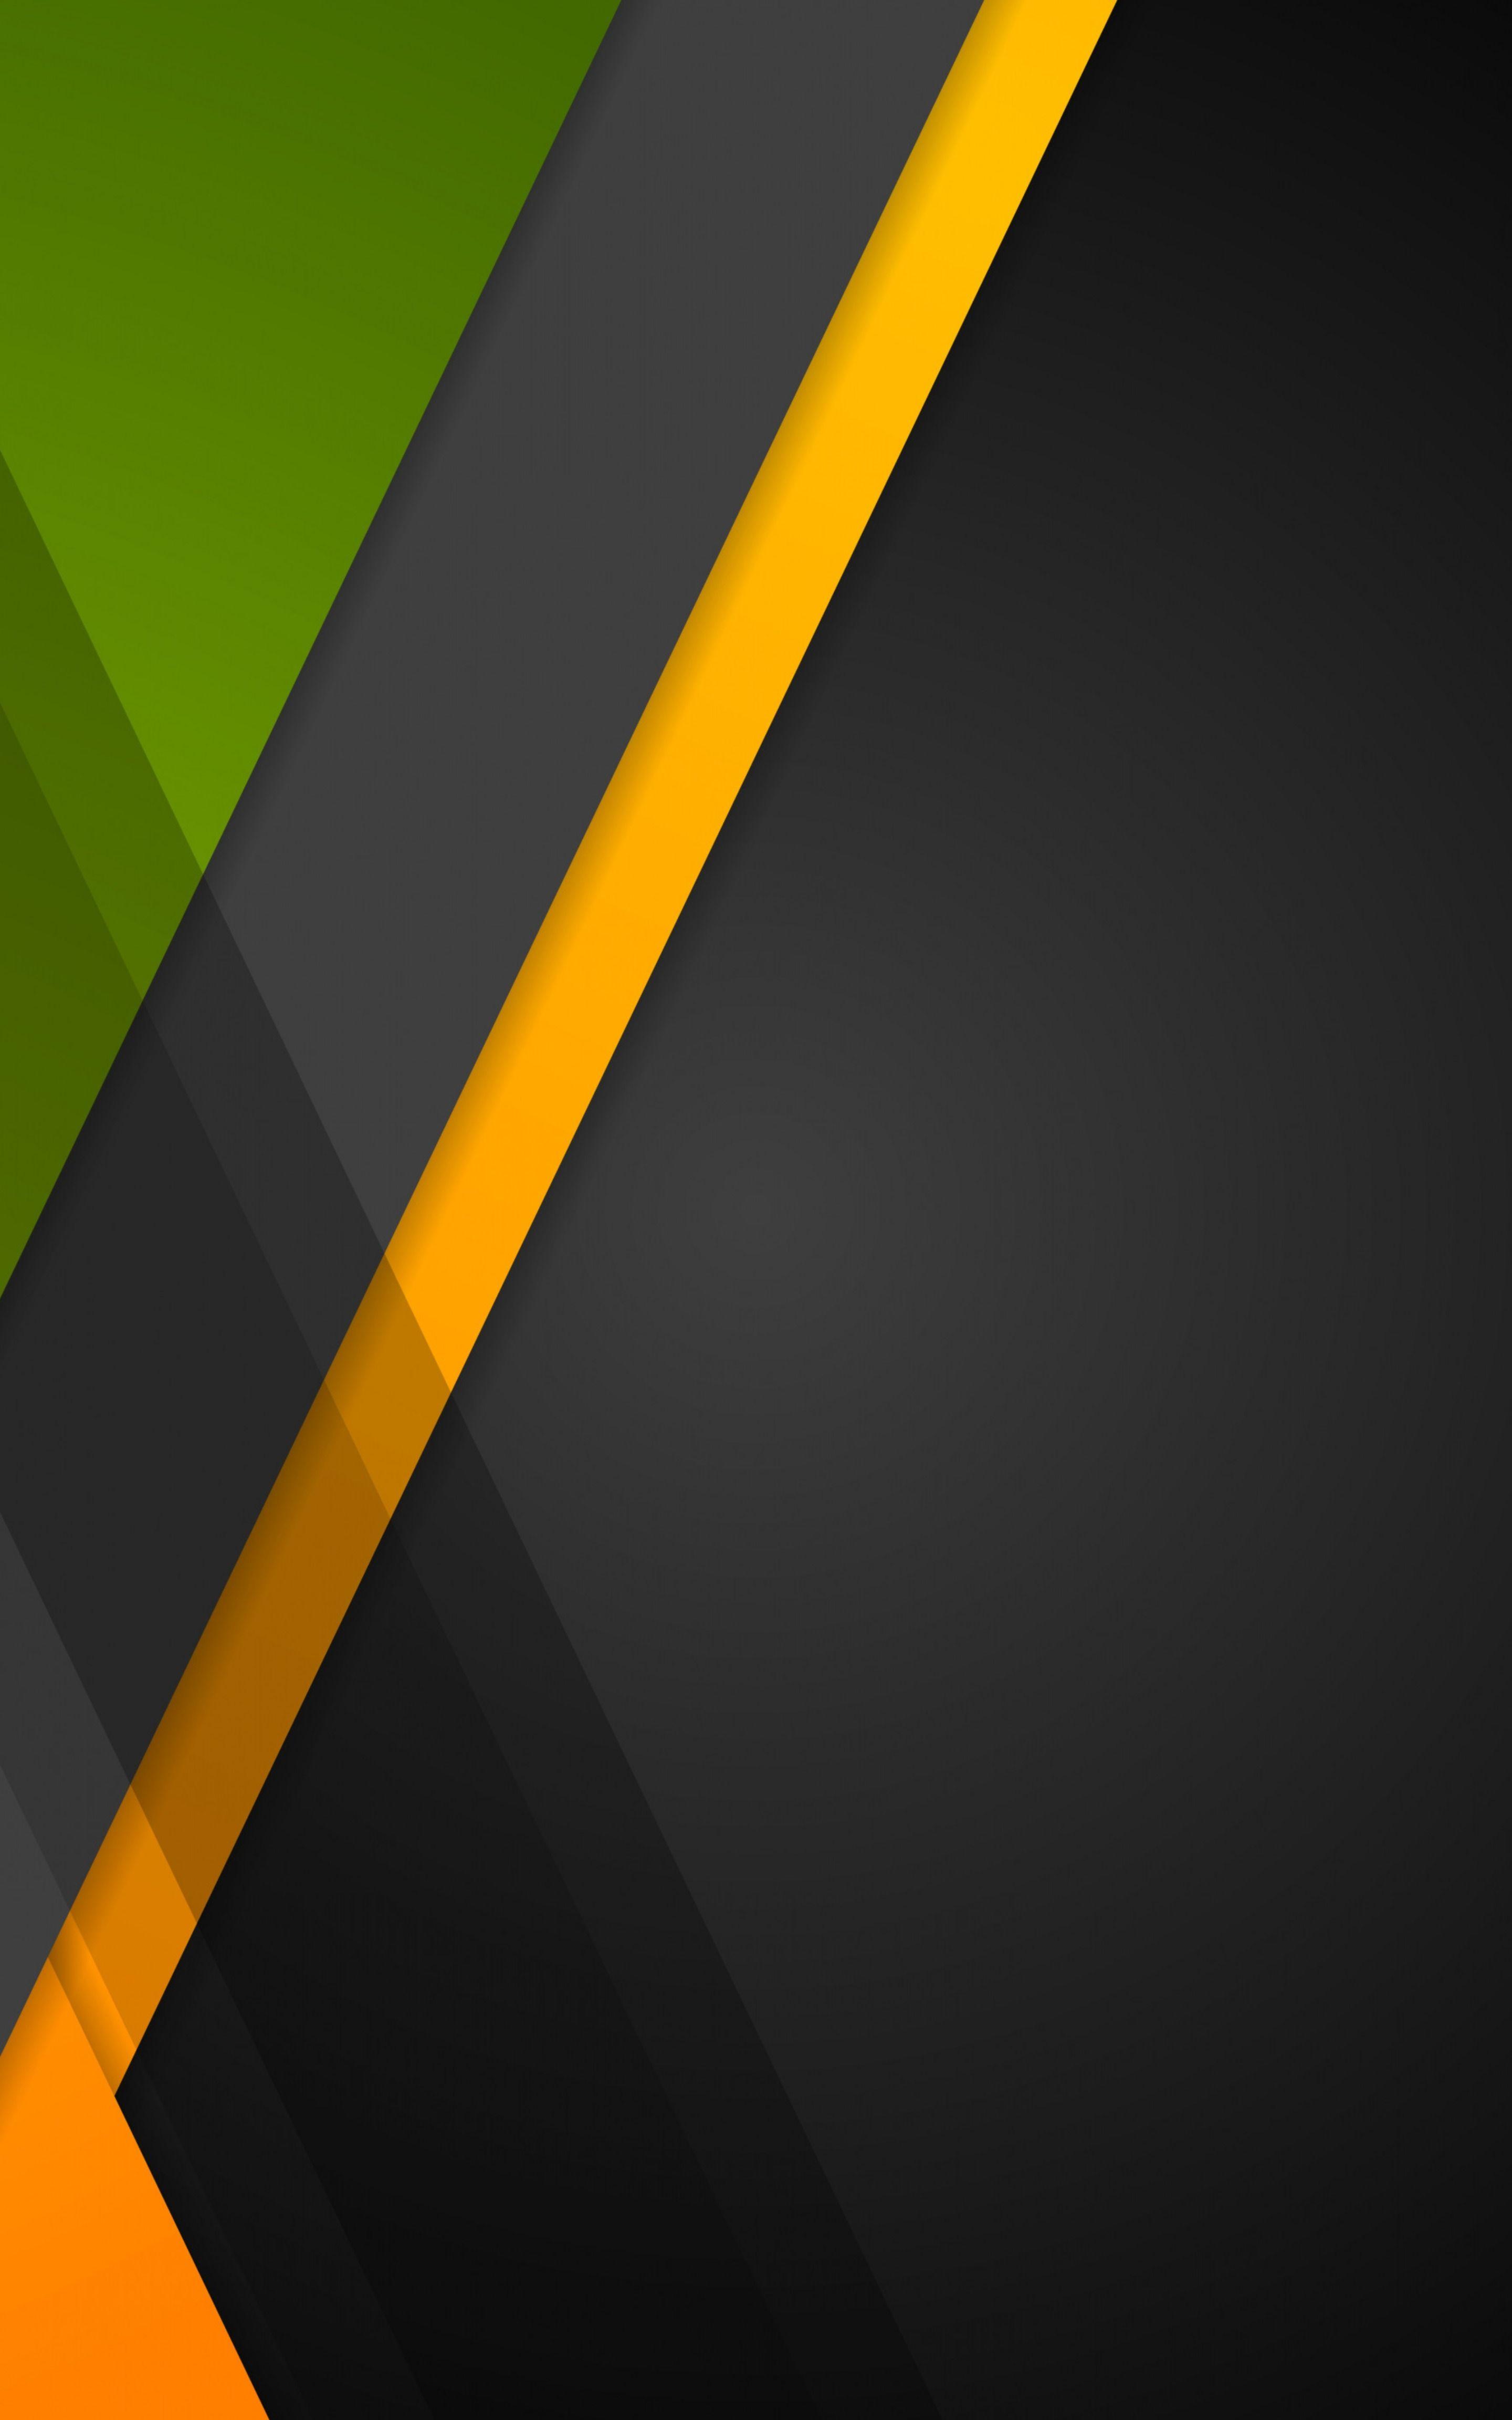 Green Black Orange Background Design Abstract Geometry Ultrahd 4k Hd Phone Wallpaper Geometric Desain Grafis